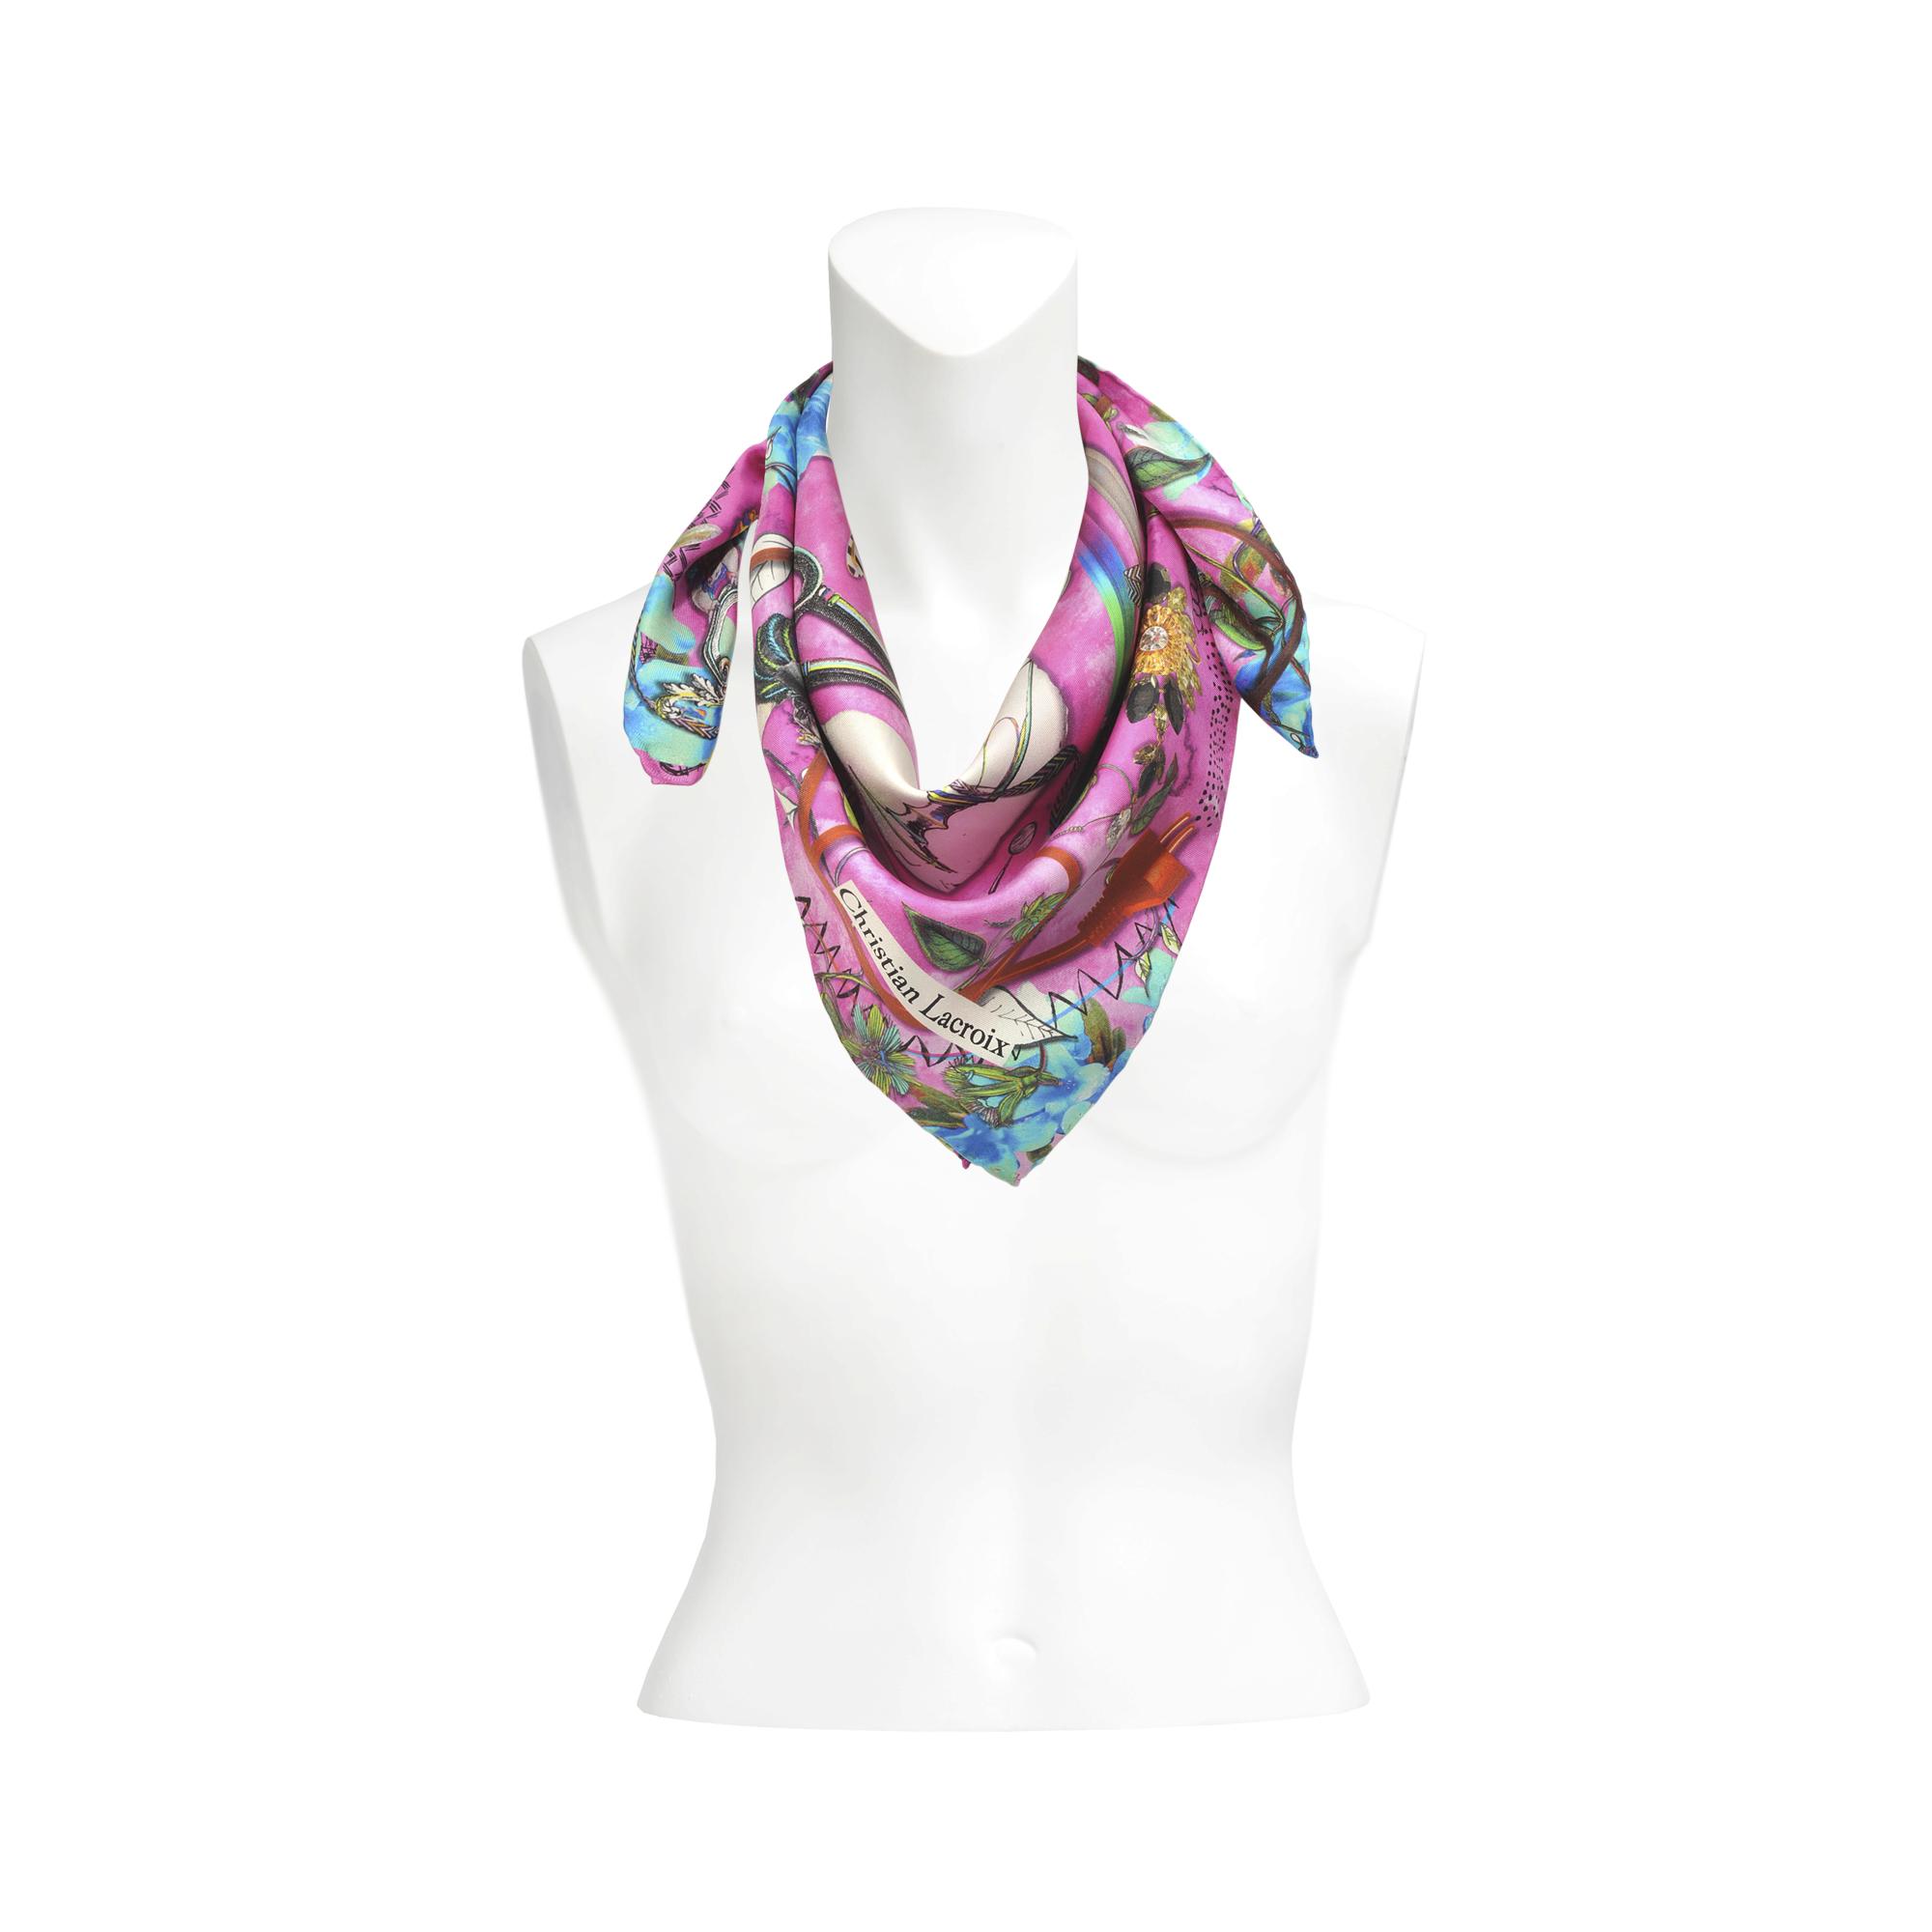 christian lacroix garden par tea silk scarf 70x70 in pink